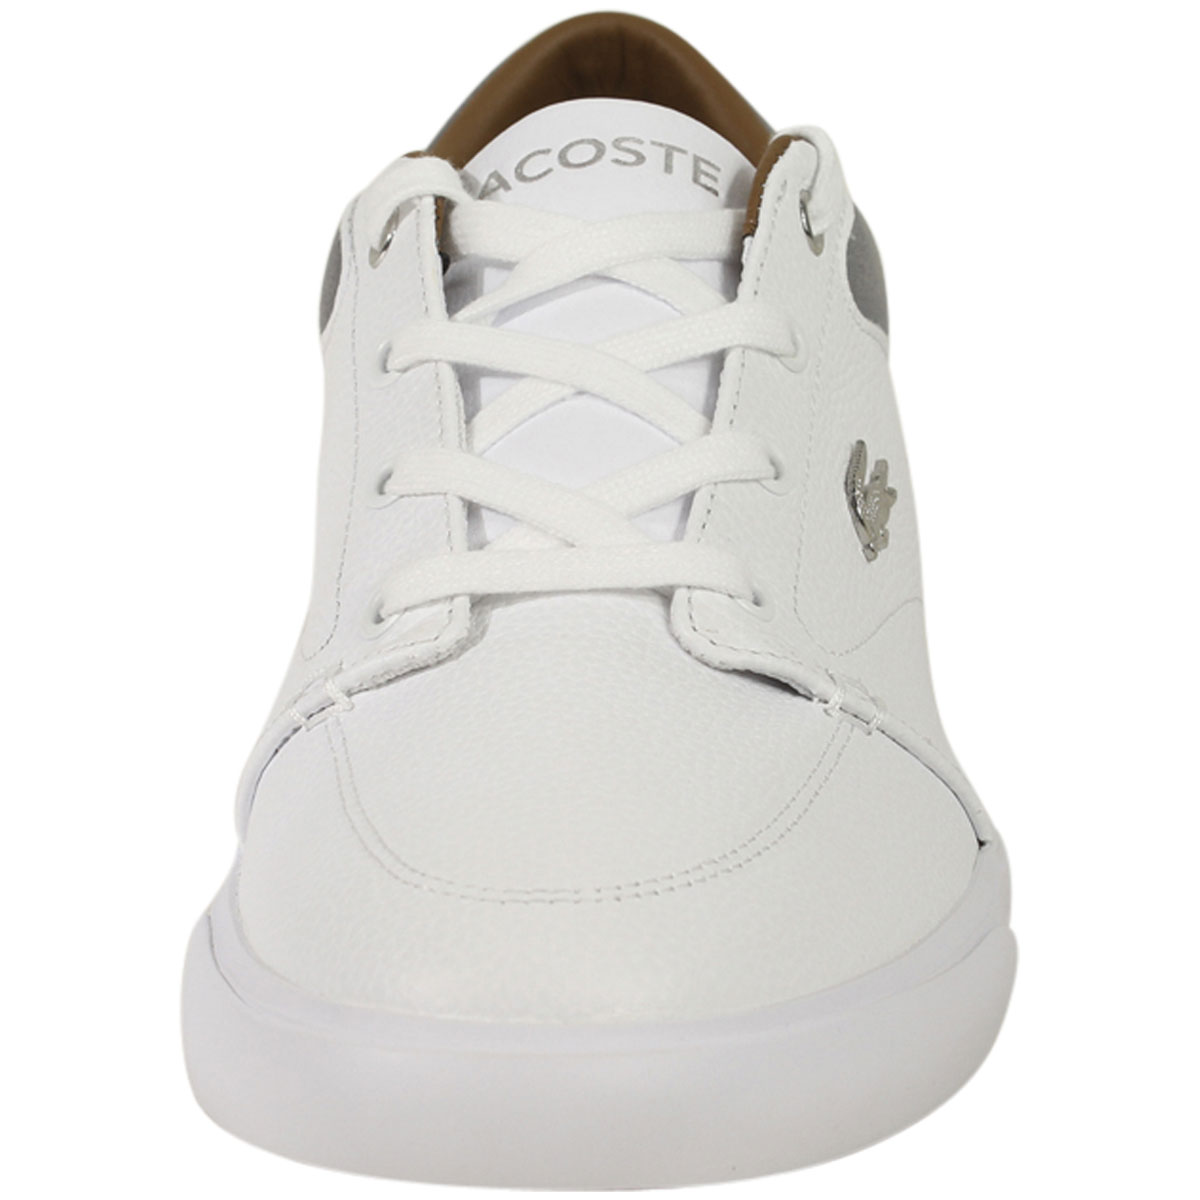 Lacoste-Men-039-s-Bayliss-118-Sneakers-Shoes thumbnail 15